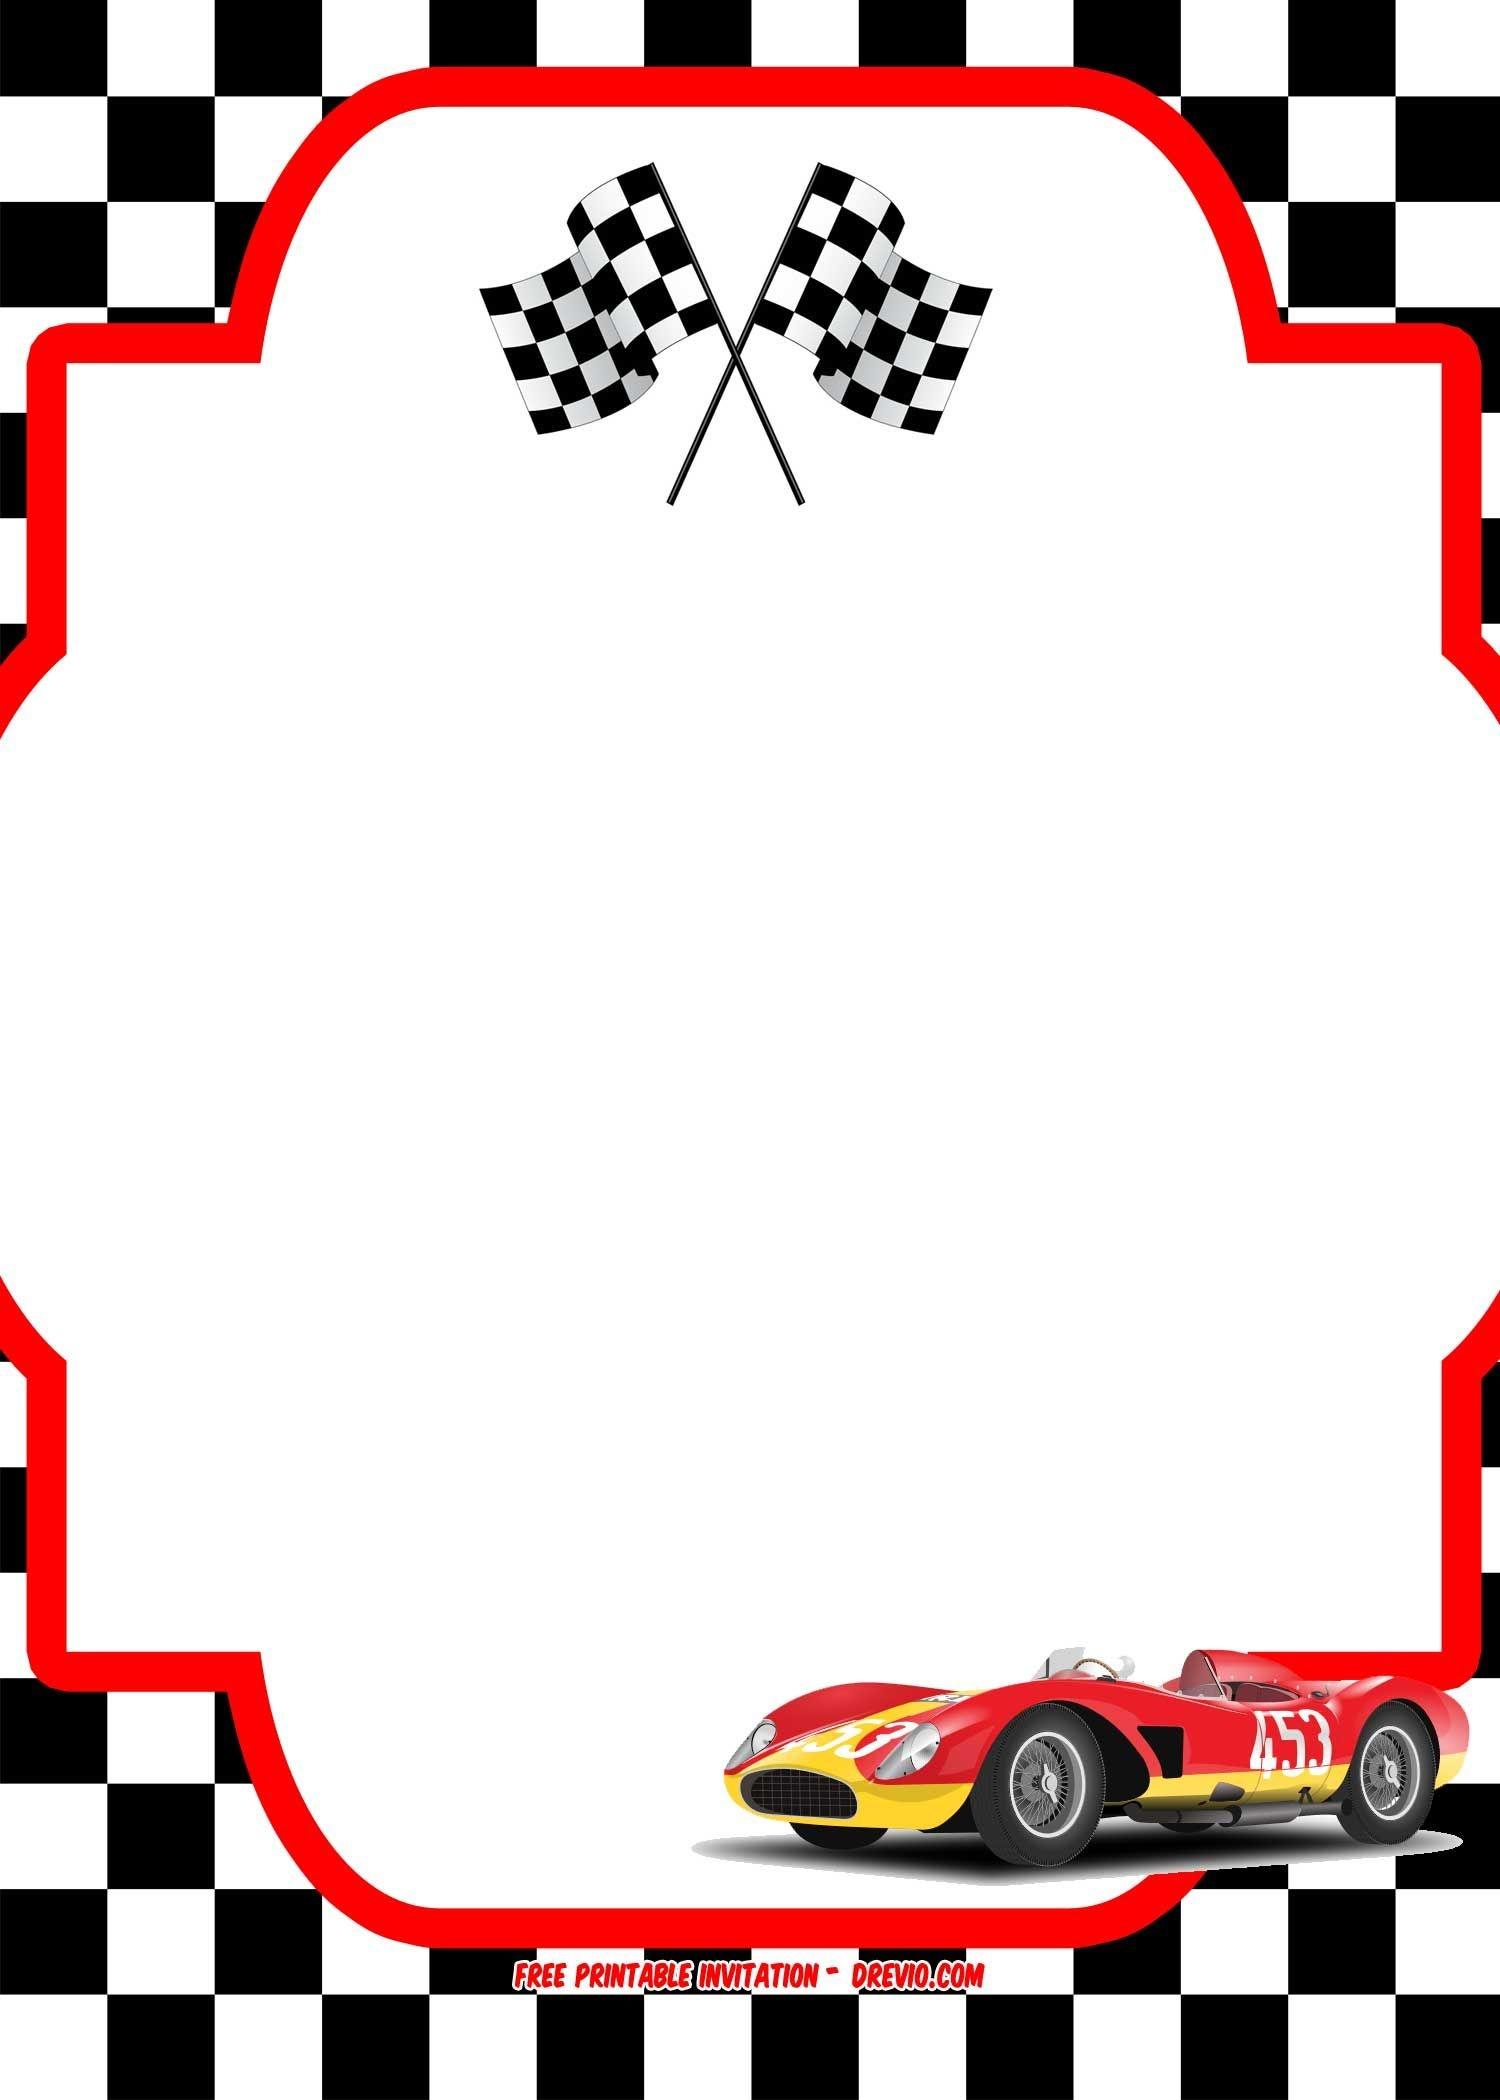 Free Race Car Birthday Invitation Template - Printable | Free - Free Printable Birthday Invitations Cars Theme